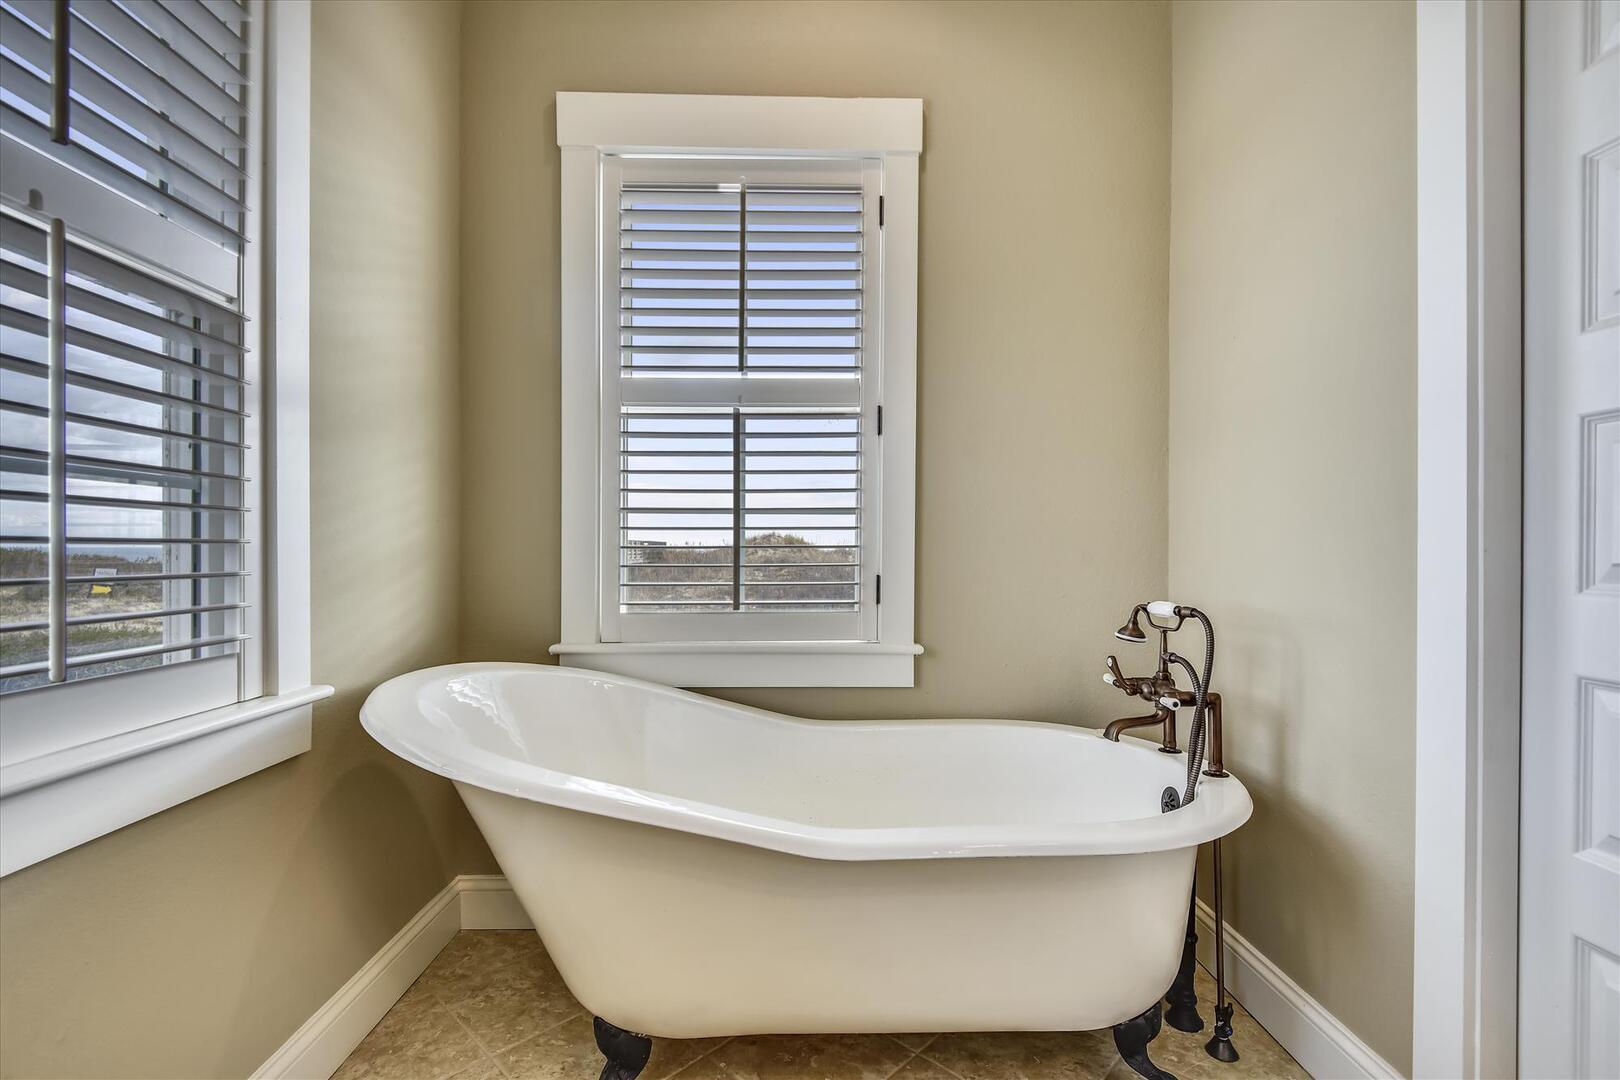 Bridal Suite,Bridal Suite- Tub,